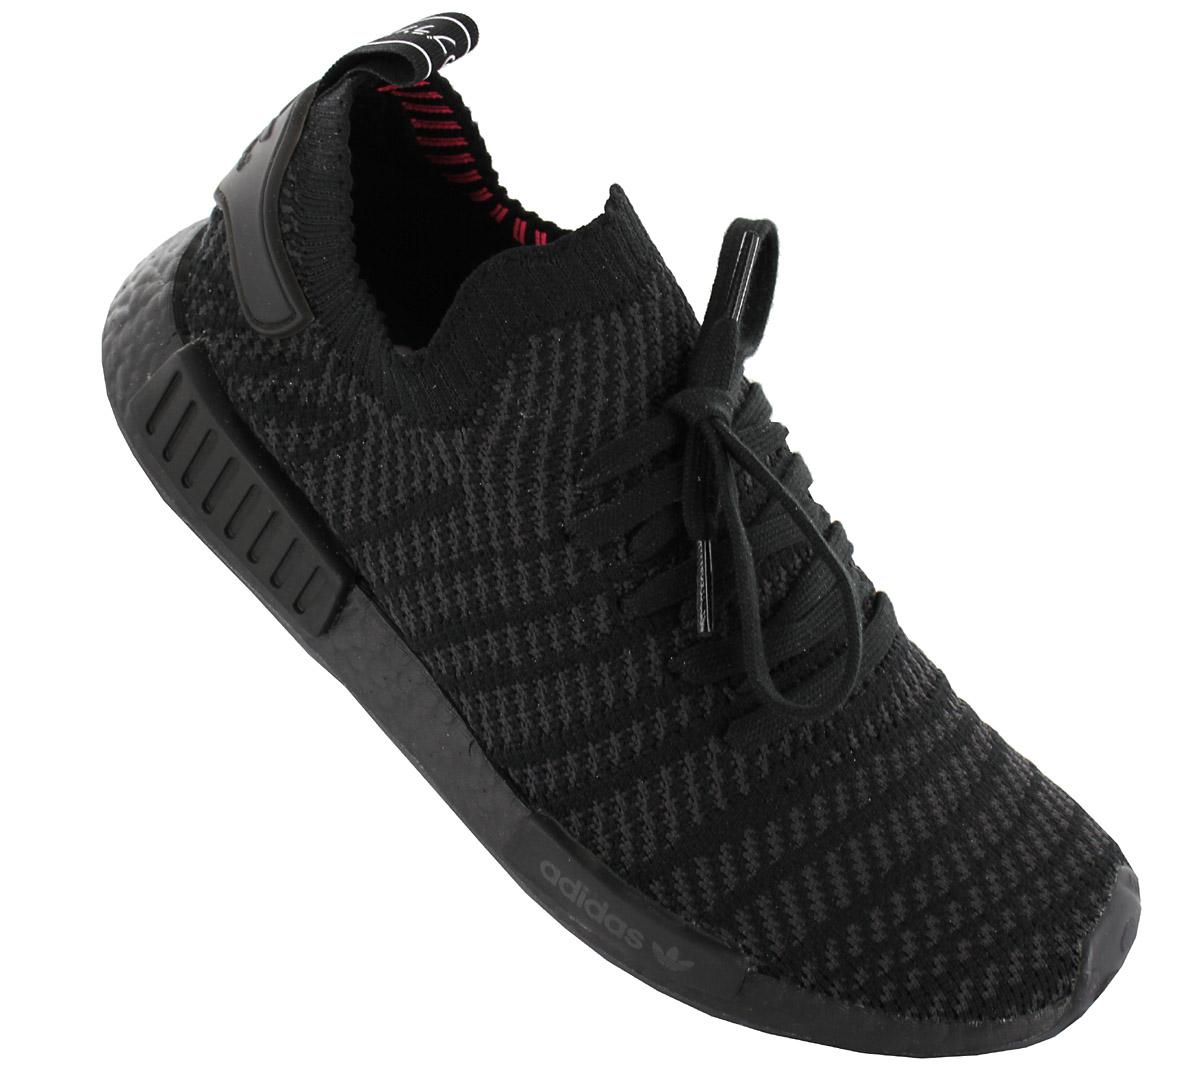 best sneakers 96e9f 87c34 Adidas NMD R1 STLT PK Primeknit Mens Sneaker Shoes Black cq2